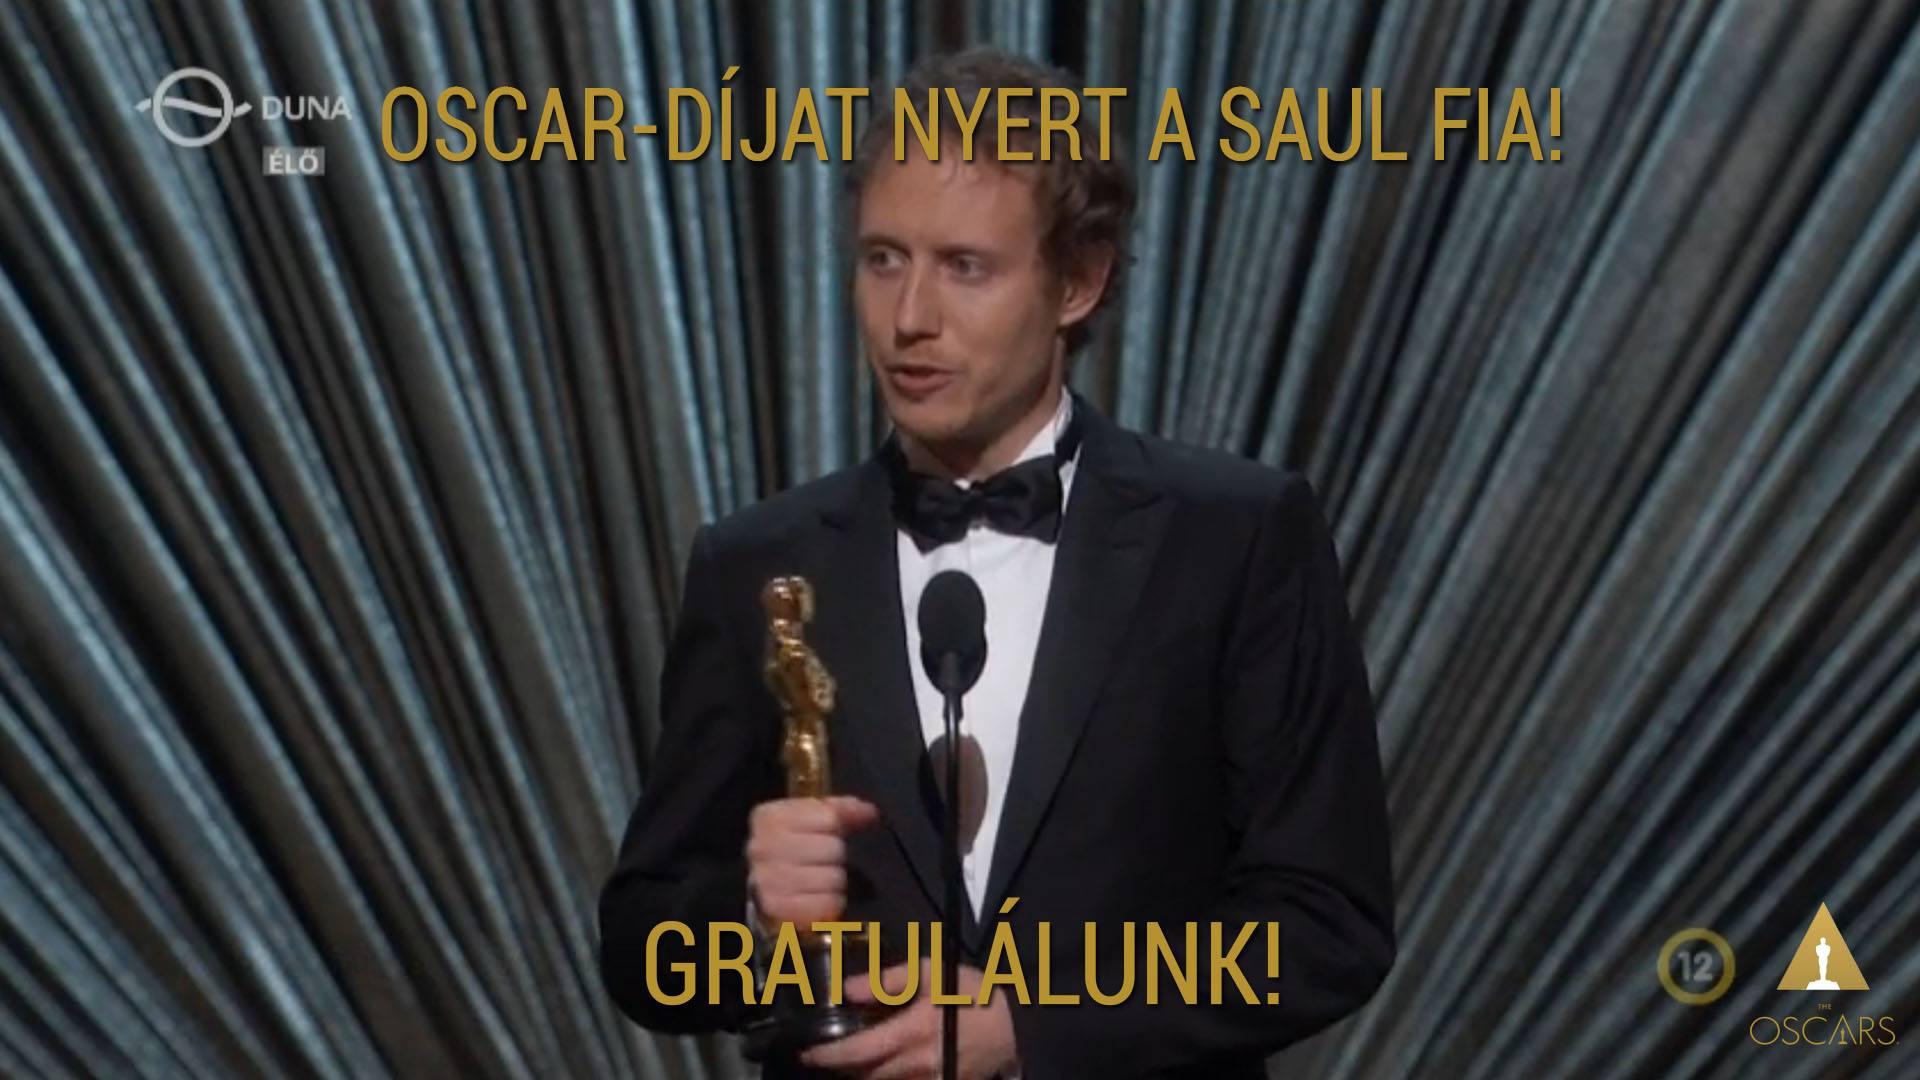 Congratulations to the Oscar-winning Son of Saul.